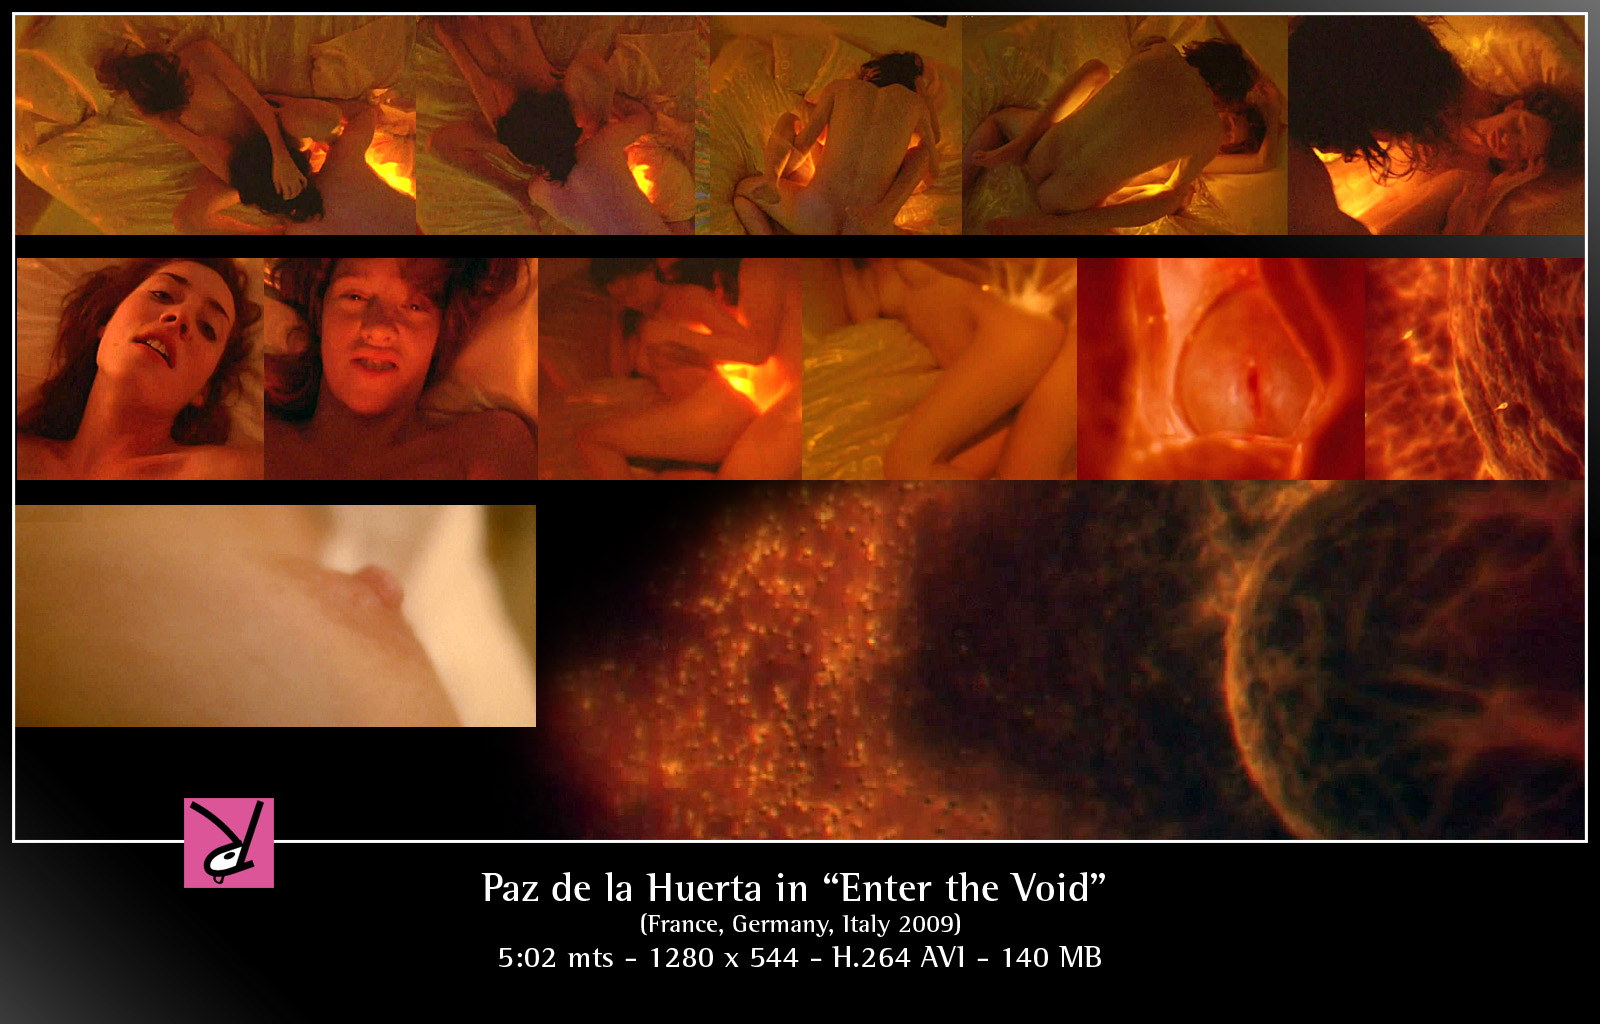 Antares - Sex Scenes Mainstream 2 - XVIDEOSCOM